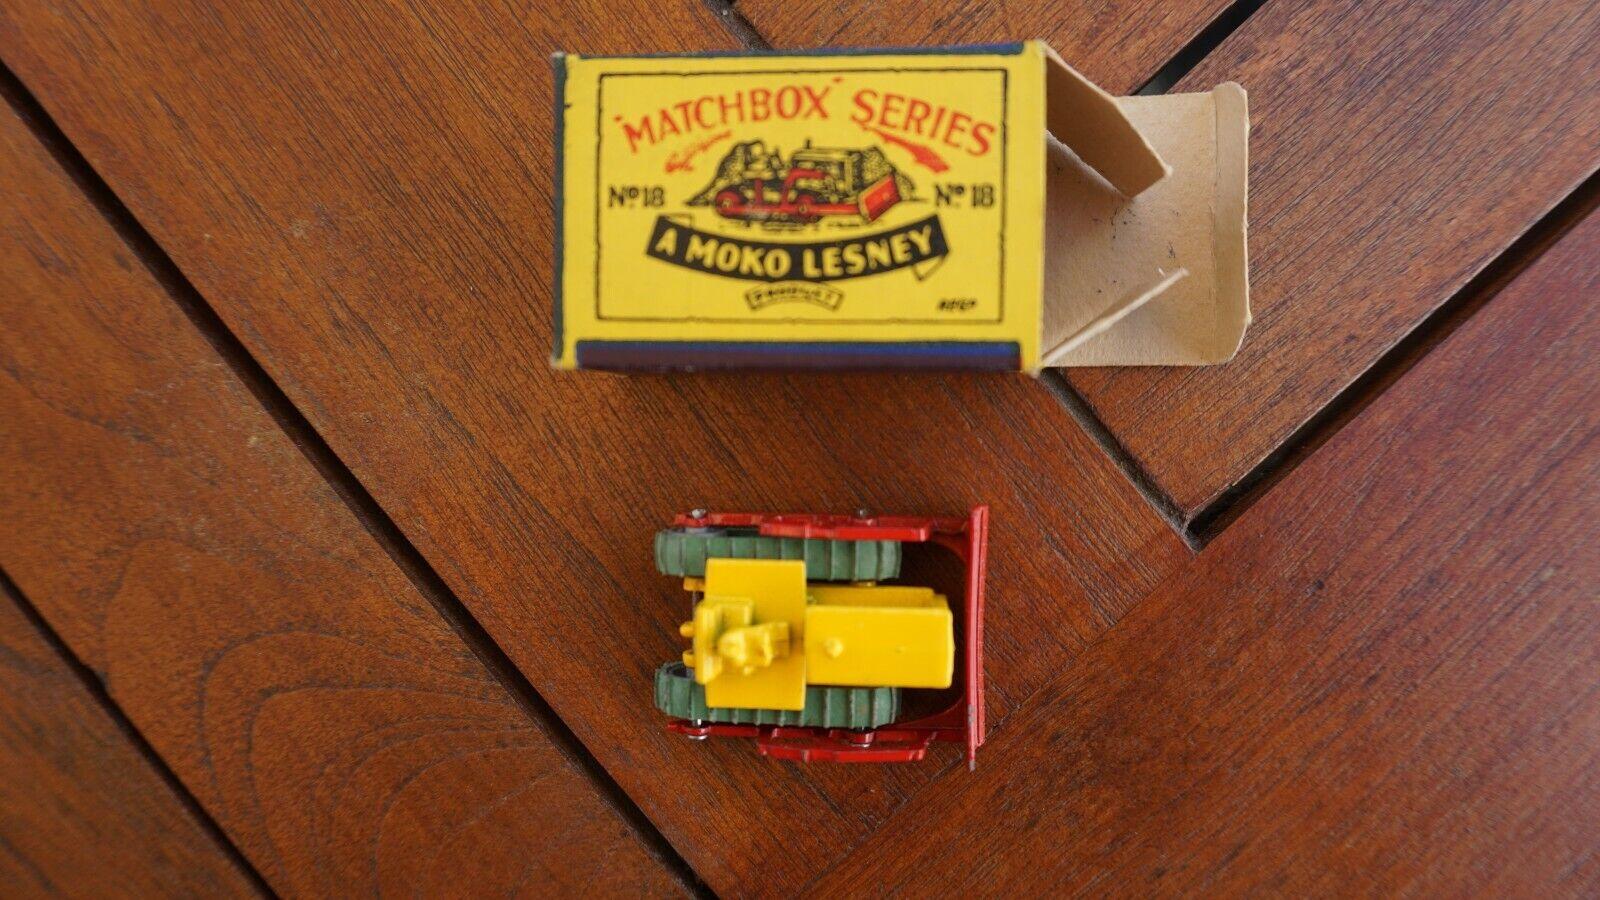 Planierraupe - - - Matchbox Nr. 18 (Moko Lesney) 7bd9c8